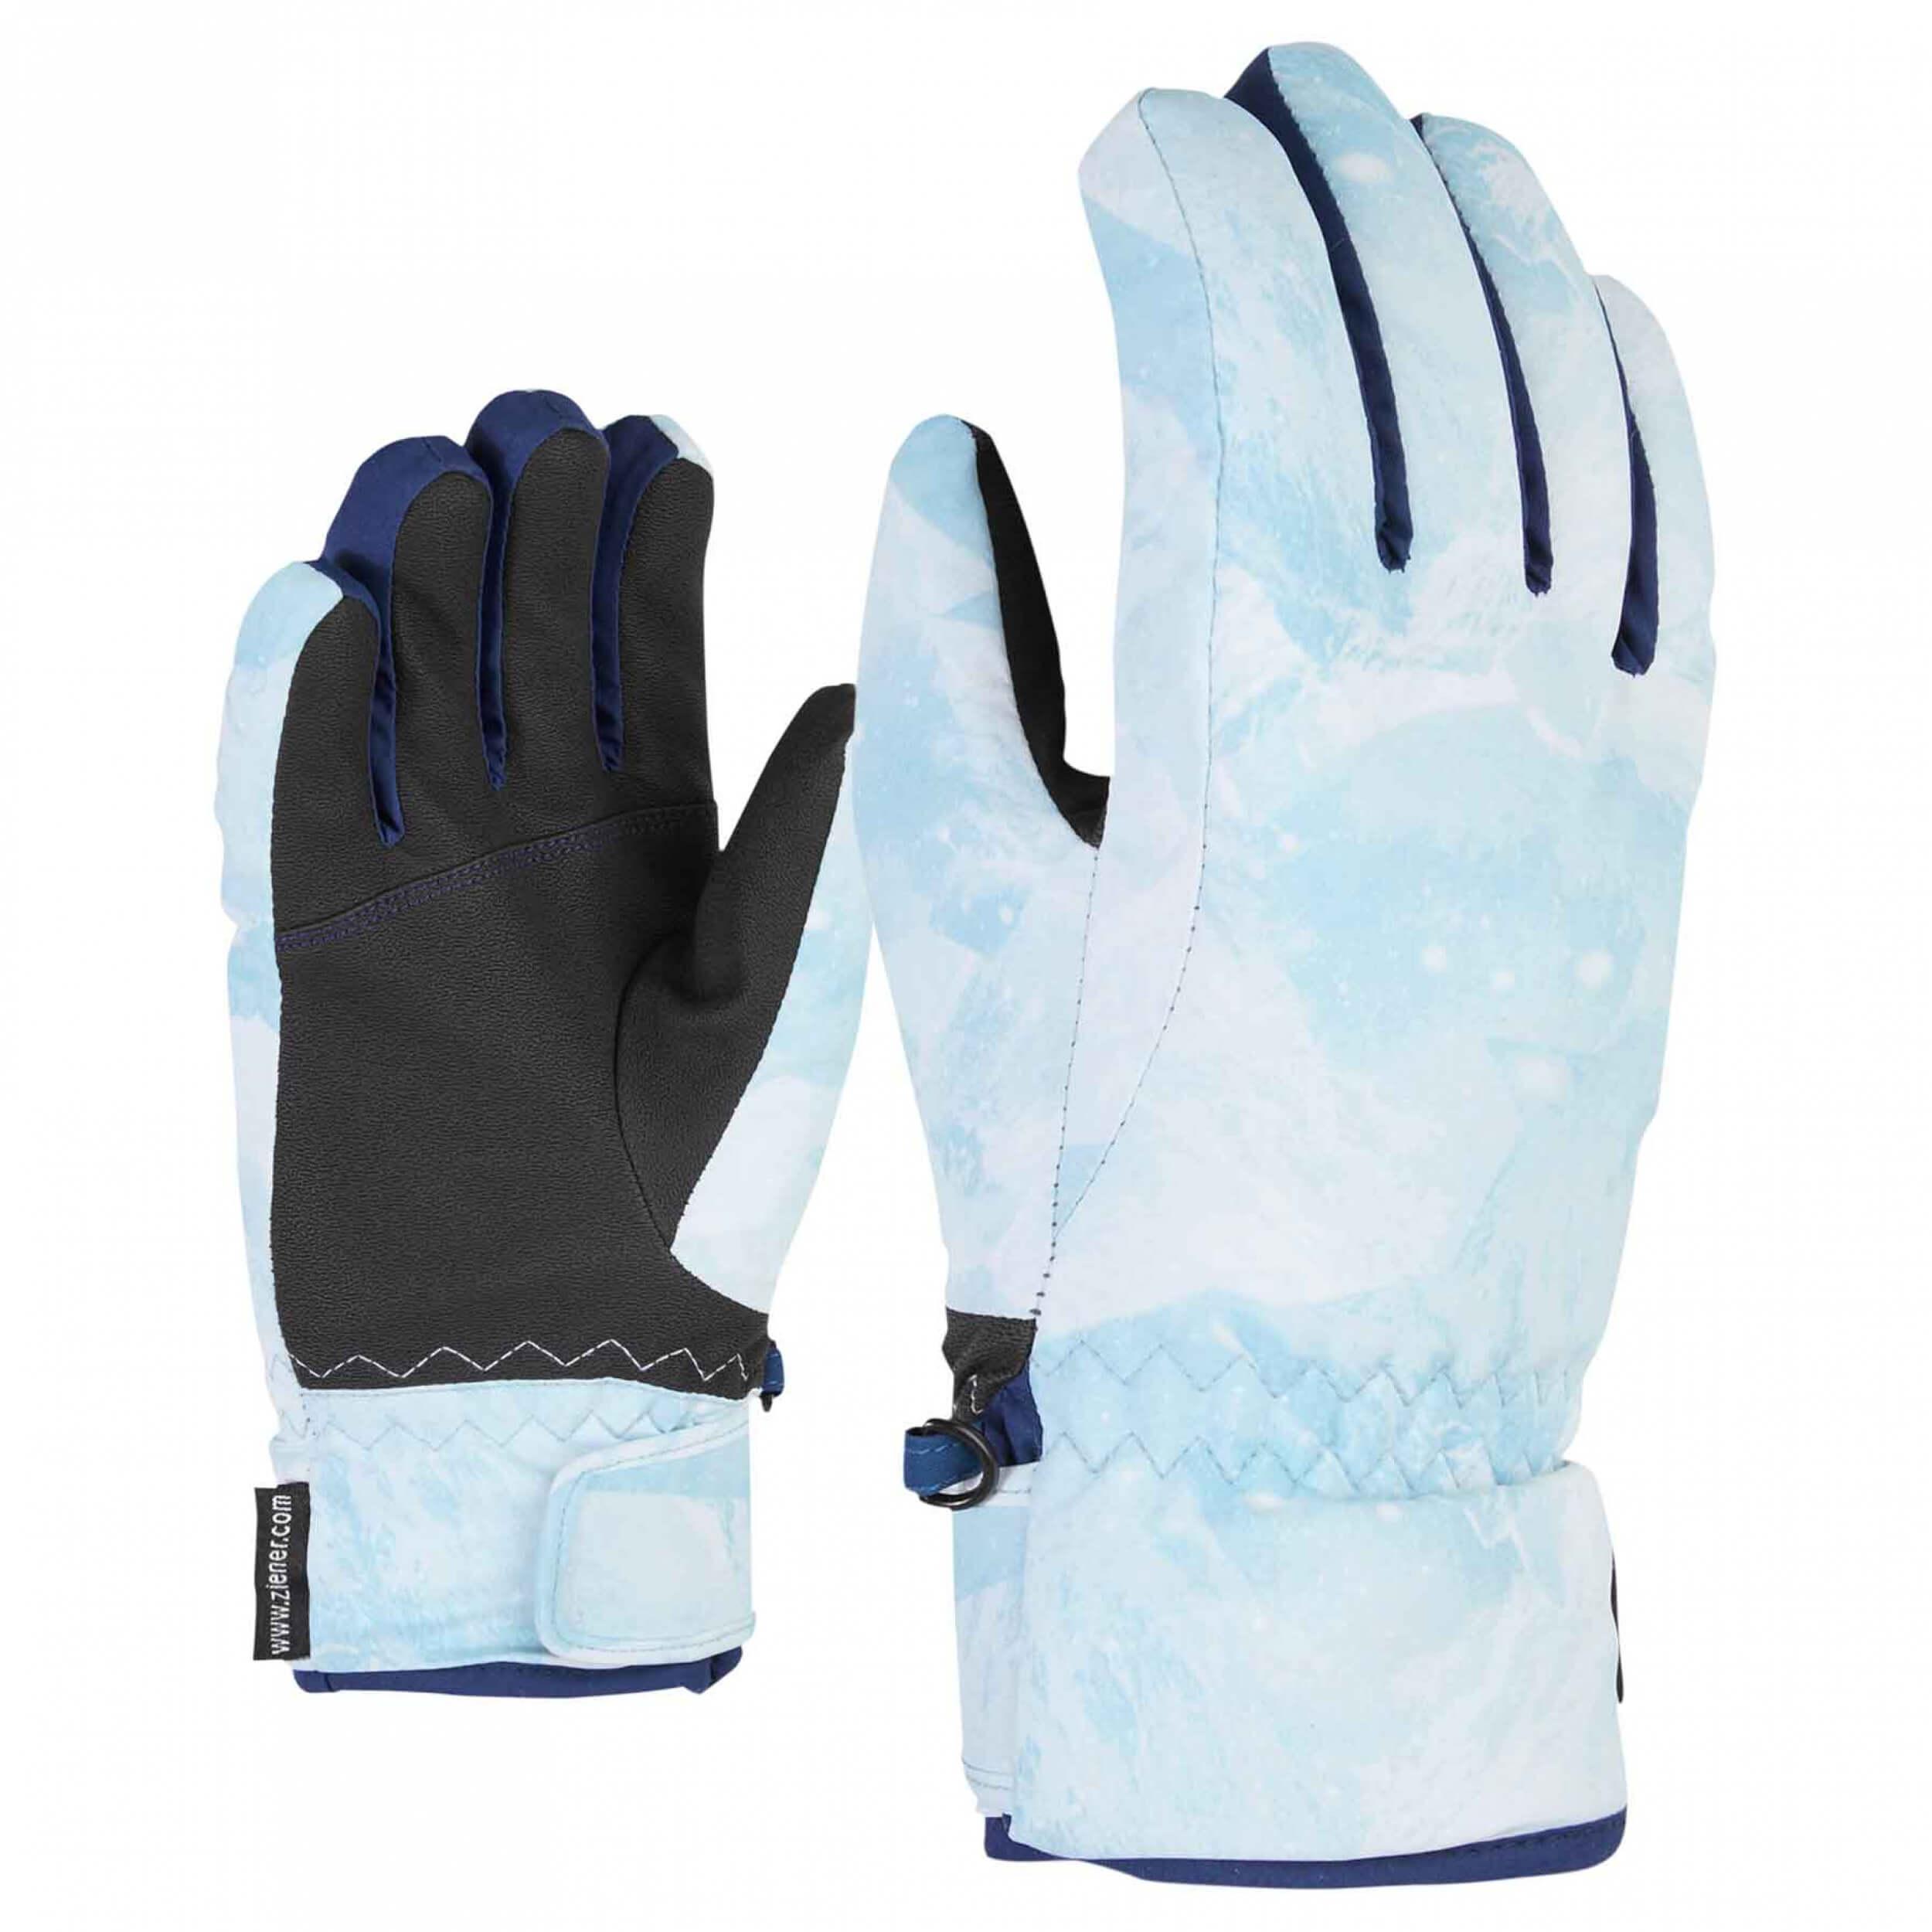 ZIENER Kinder Ski-Handschuhe Luffi AQUASHIELD hellblau 887